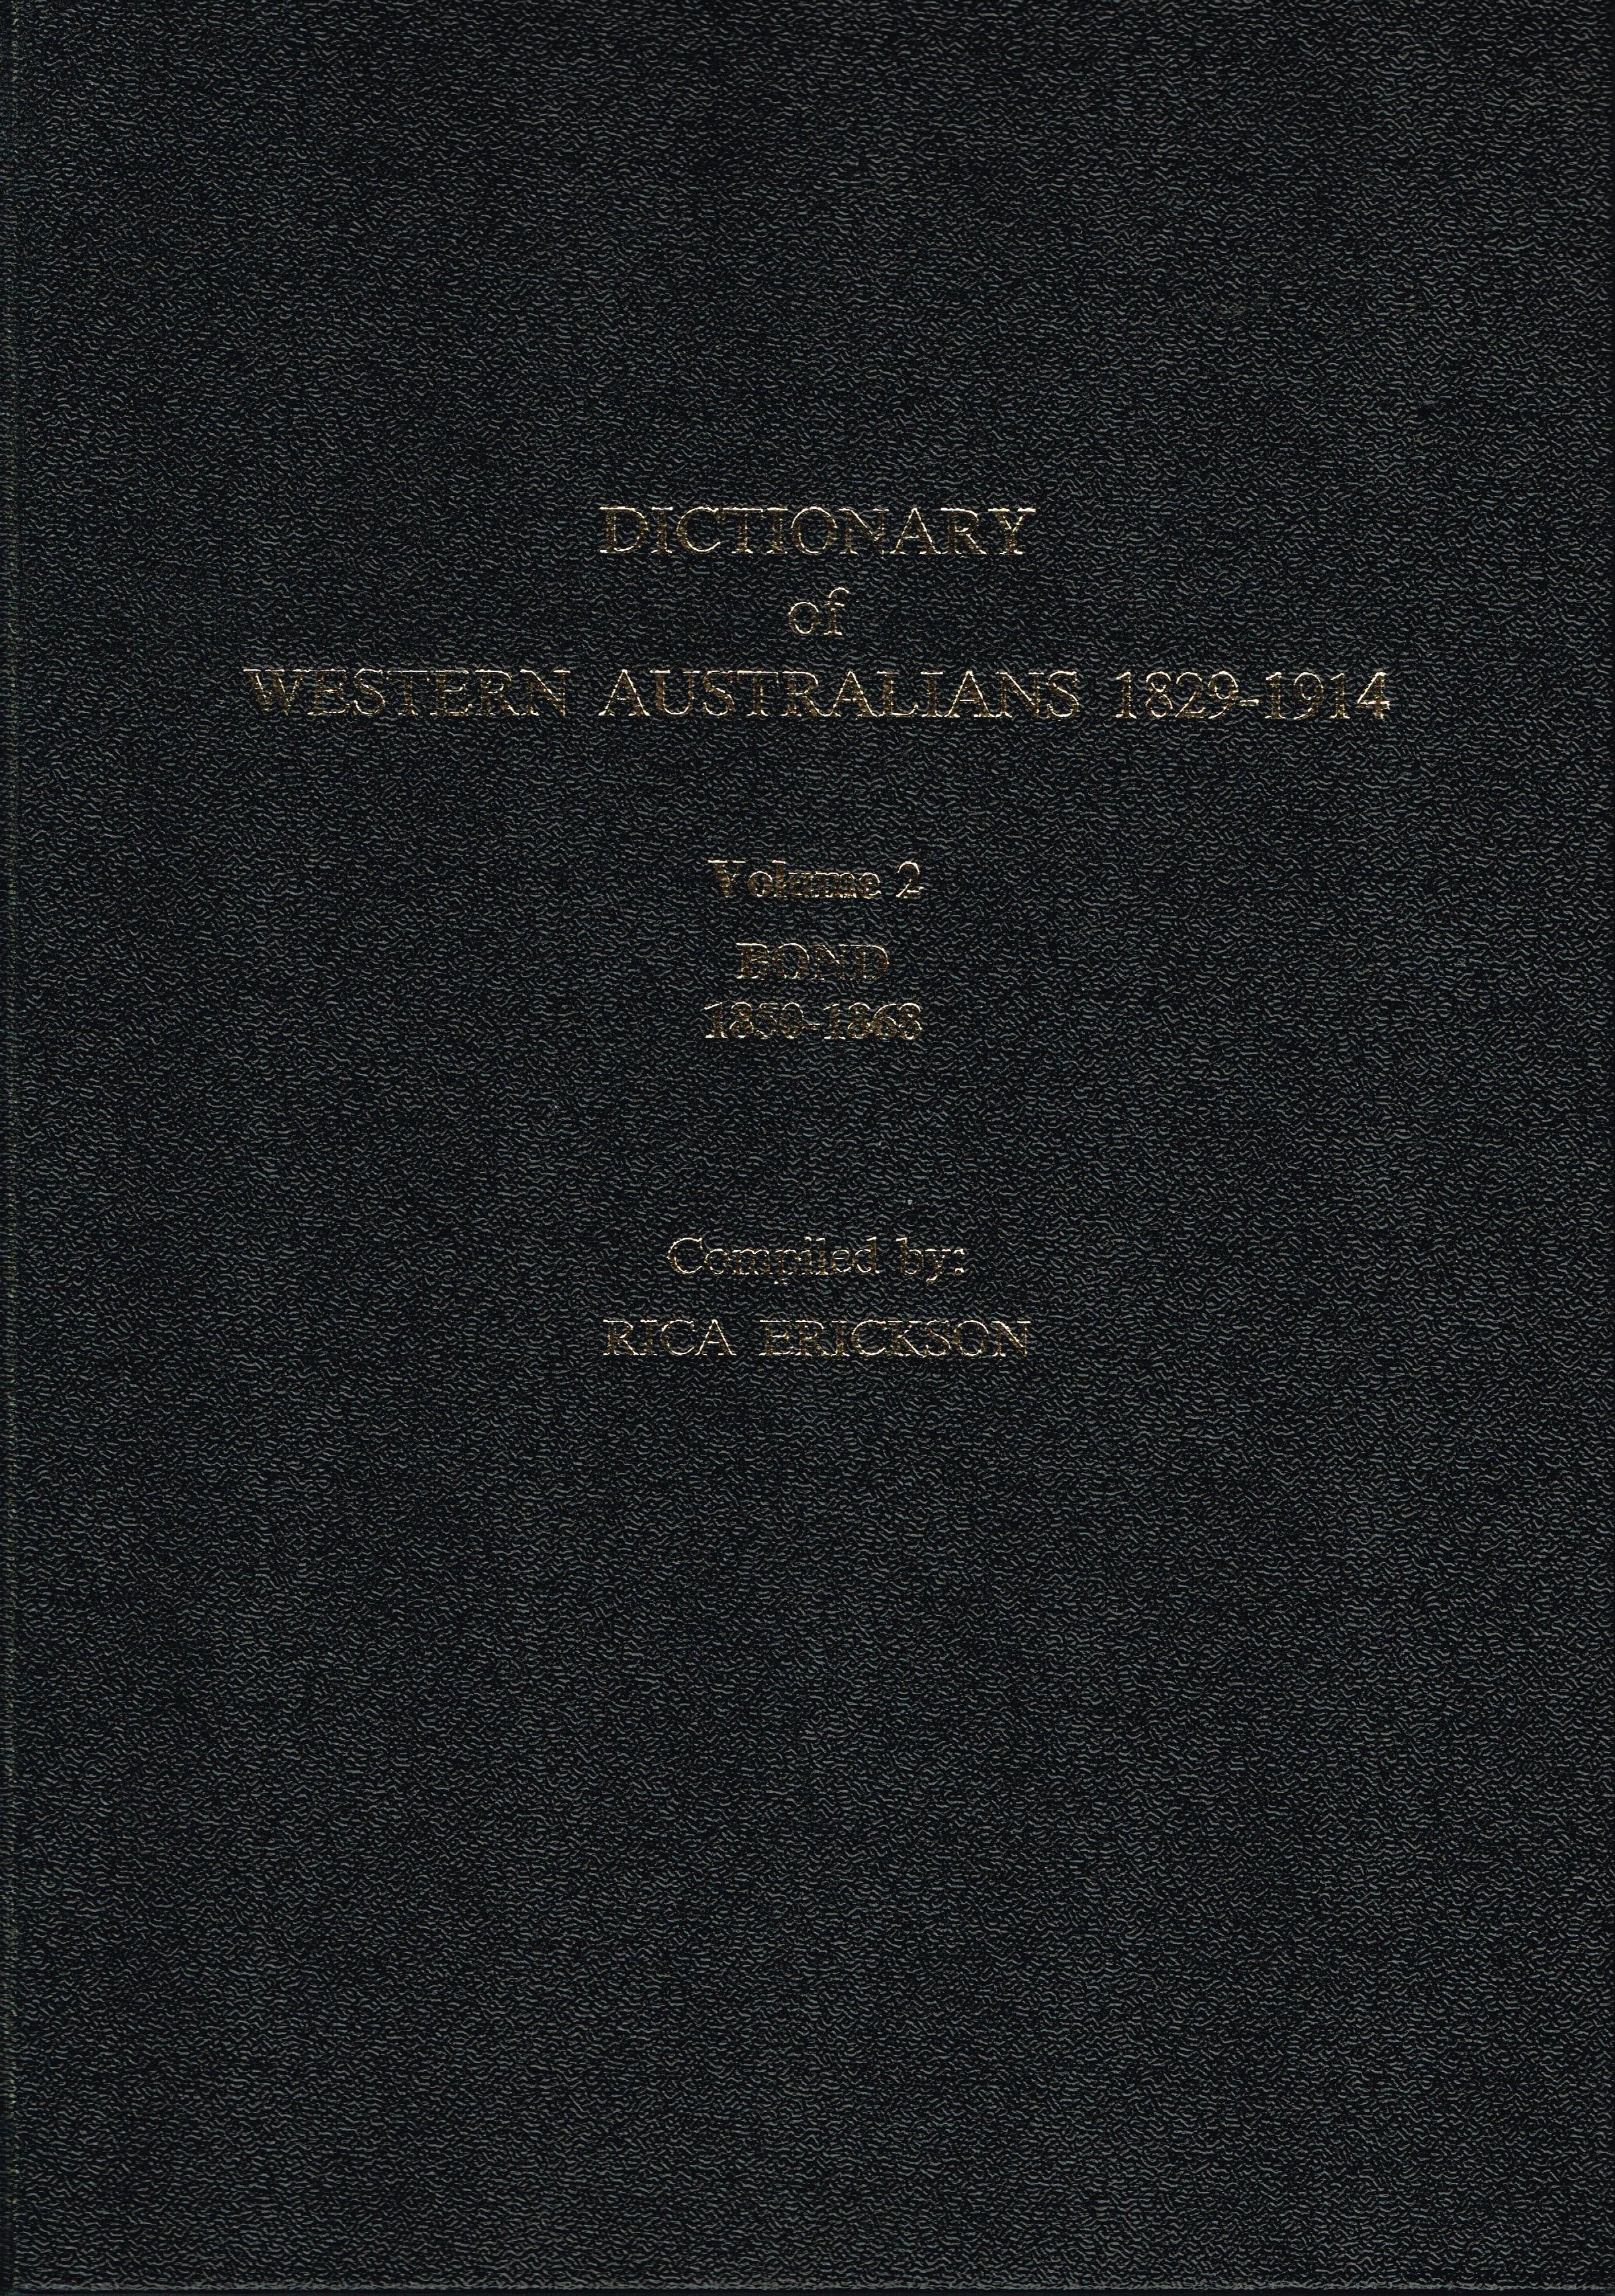 Dictionary of Western Australians 1829-1914 : Vol 2 bond 1950-1868   Complied by Rica Erickson